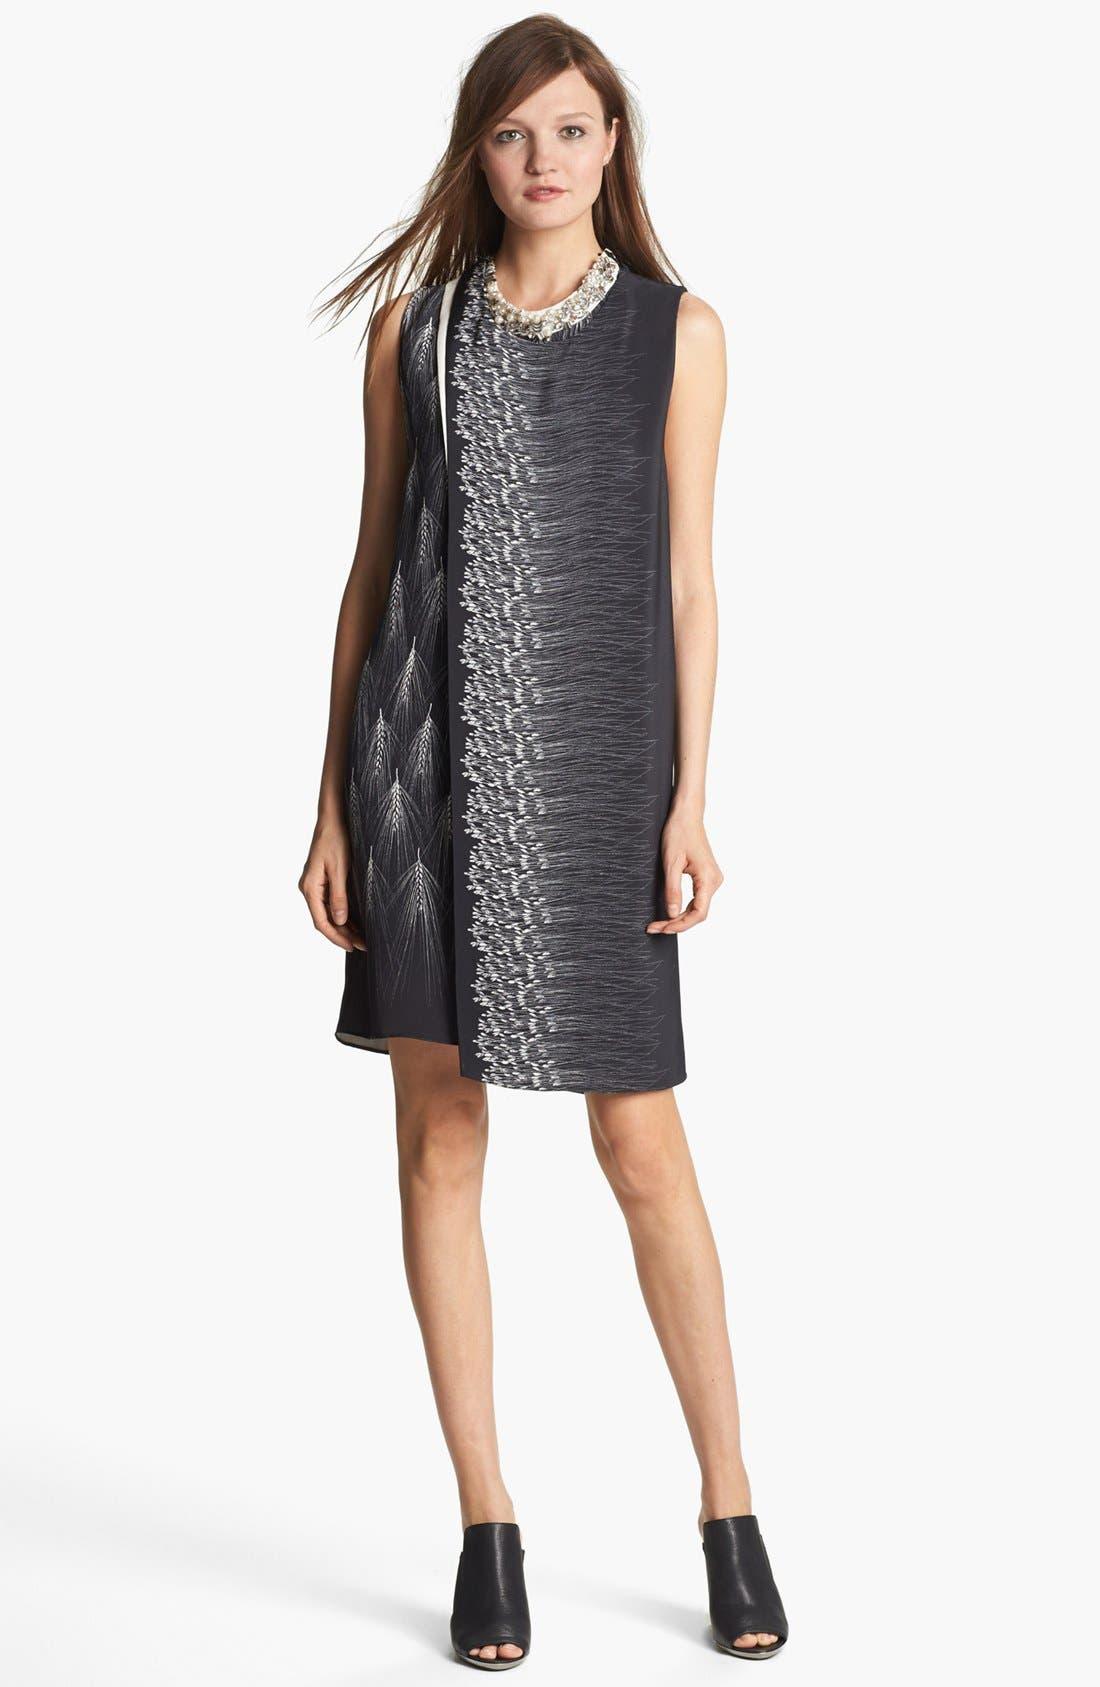 Alternate Image 1 Selected - 3.1 Phillip Lim Mix Print Layered Silk Dress